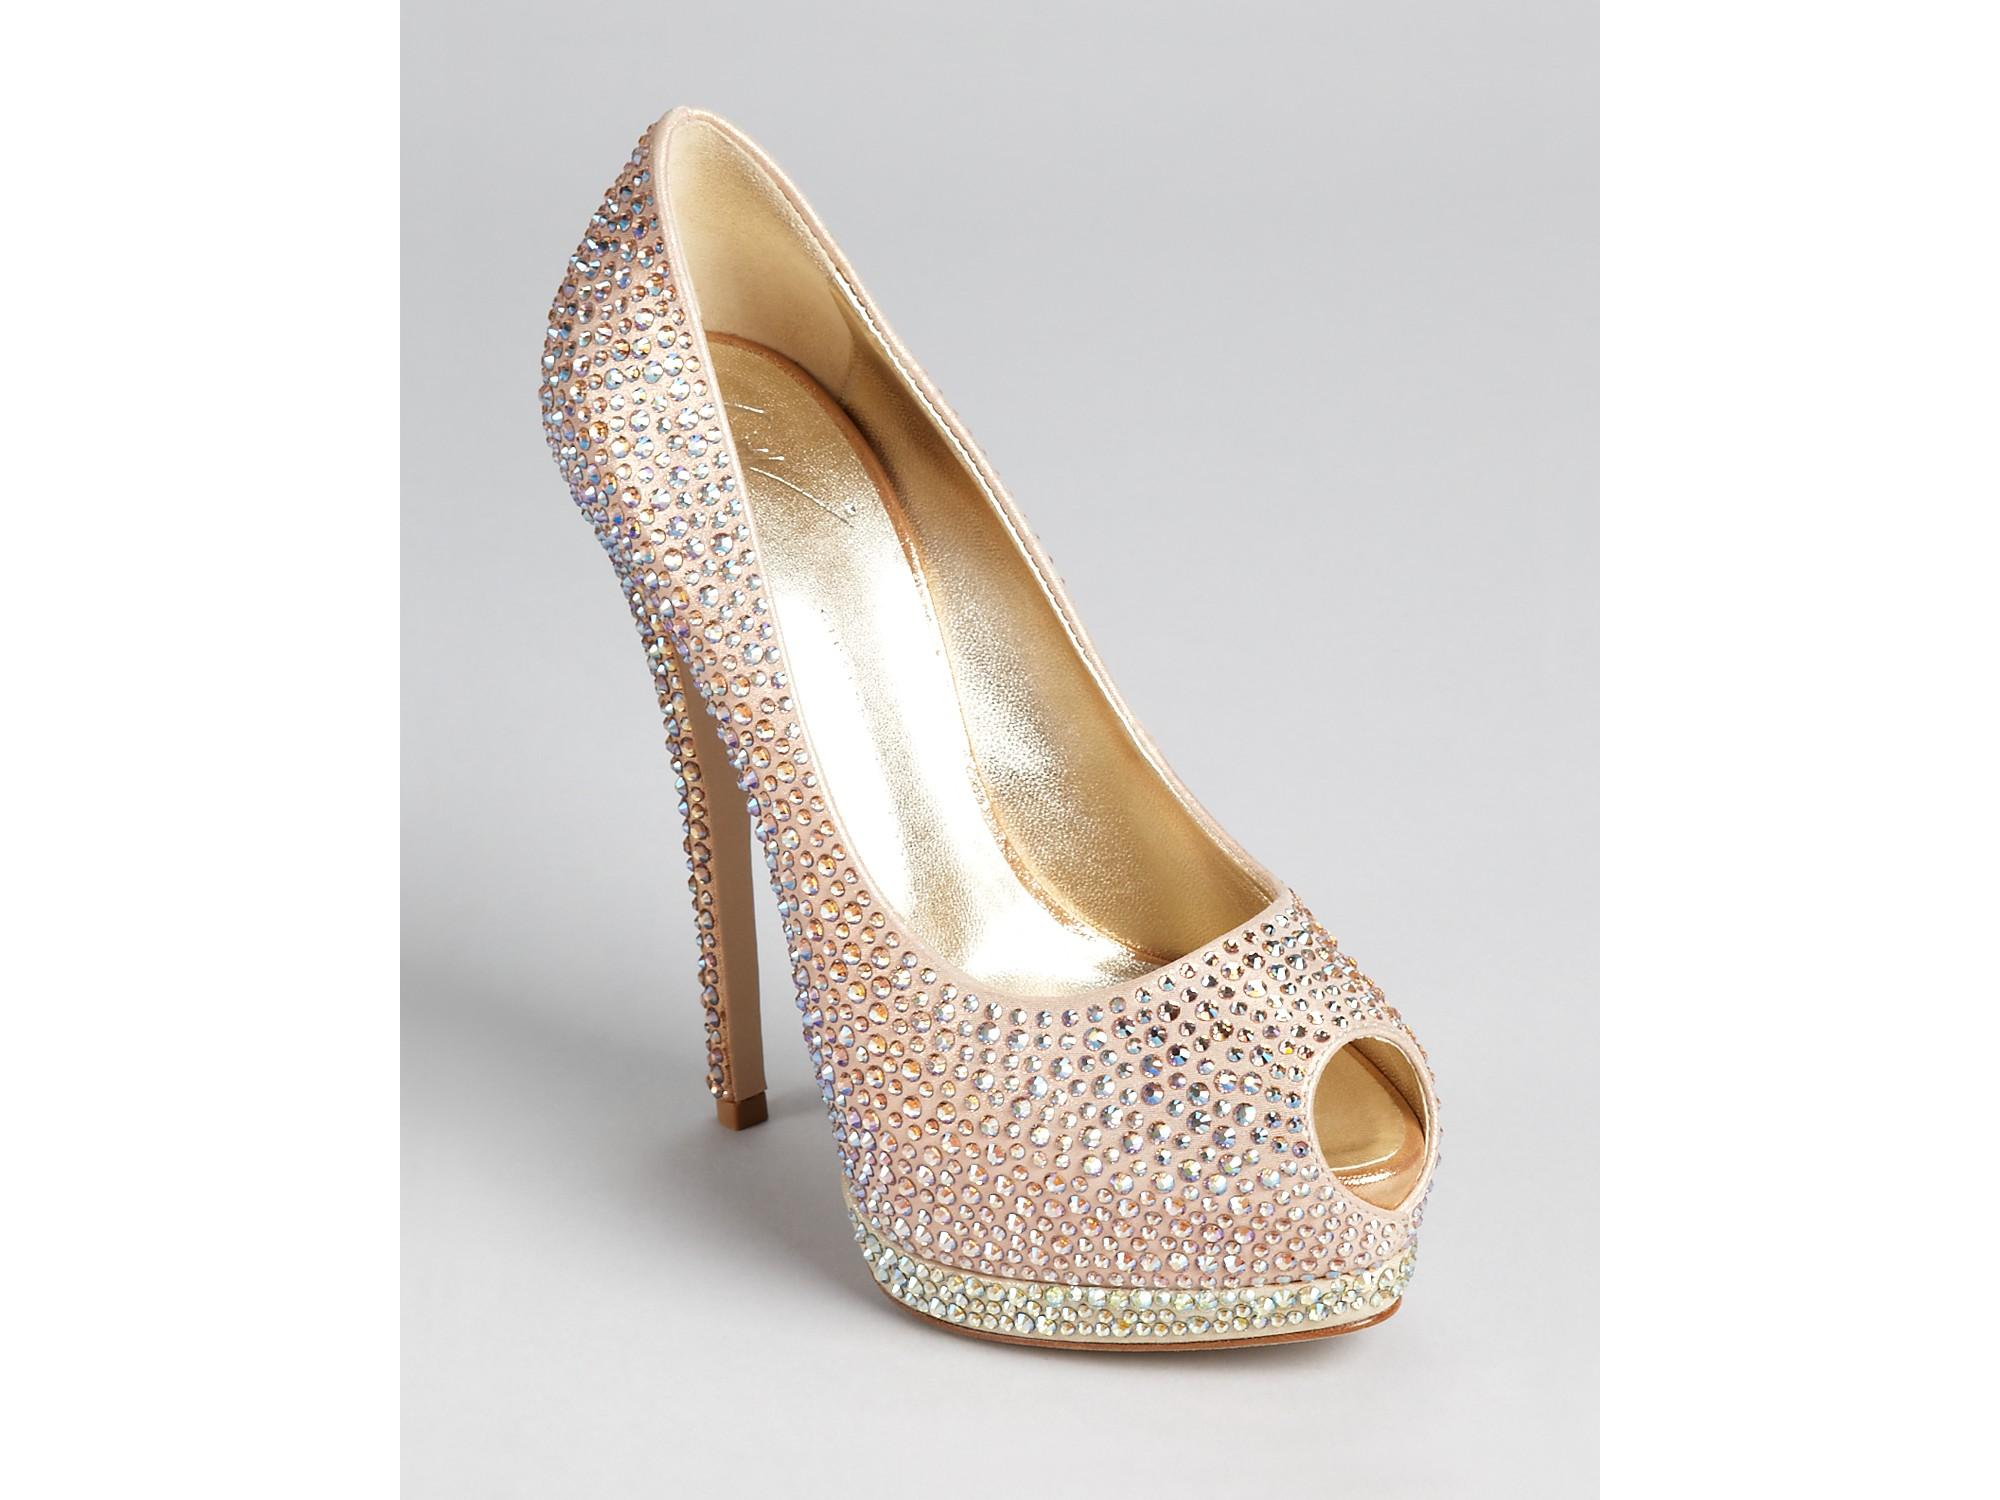 9a7b4d99987 ... real lyst giuseppe zanotti pumps sharon crystal open toe in metallic  6ad6b 141c2